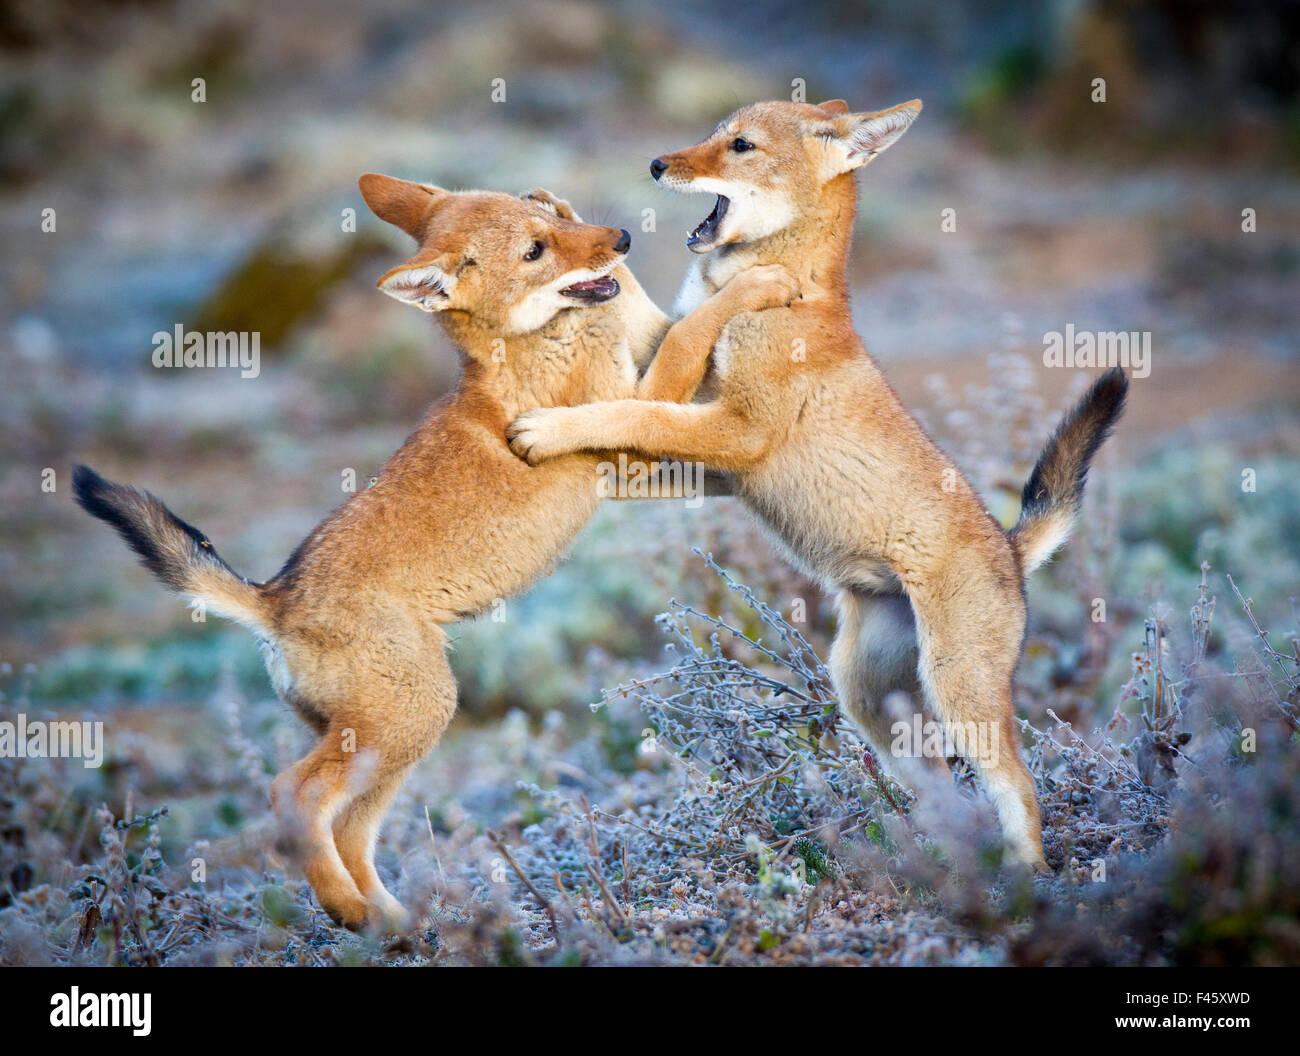 Etiope Lupo (Canis simensis) cinque mese cubs giocando, Bale Mountains National Park, Etiopia. Immagini Stock